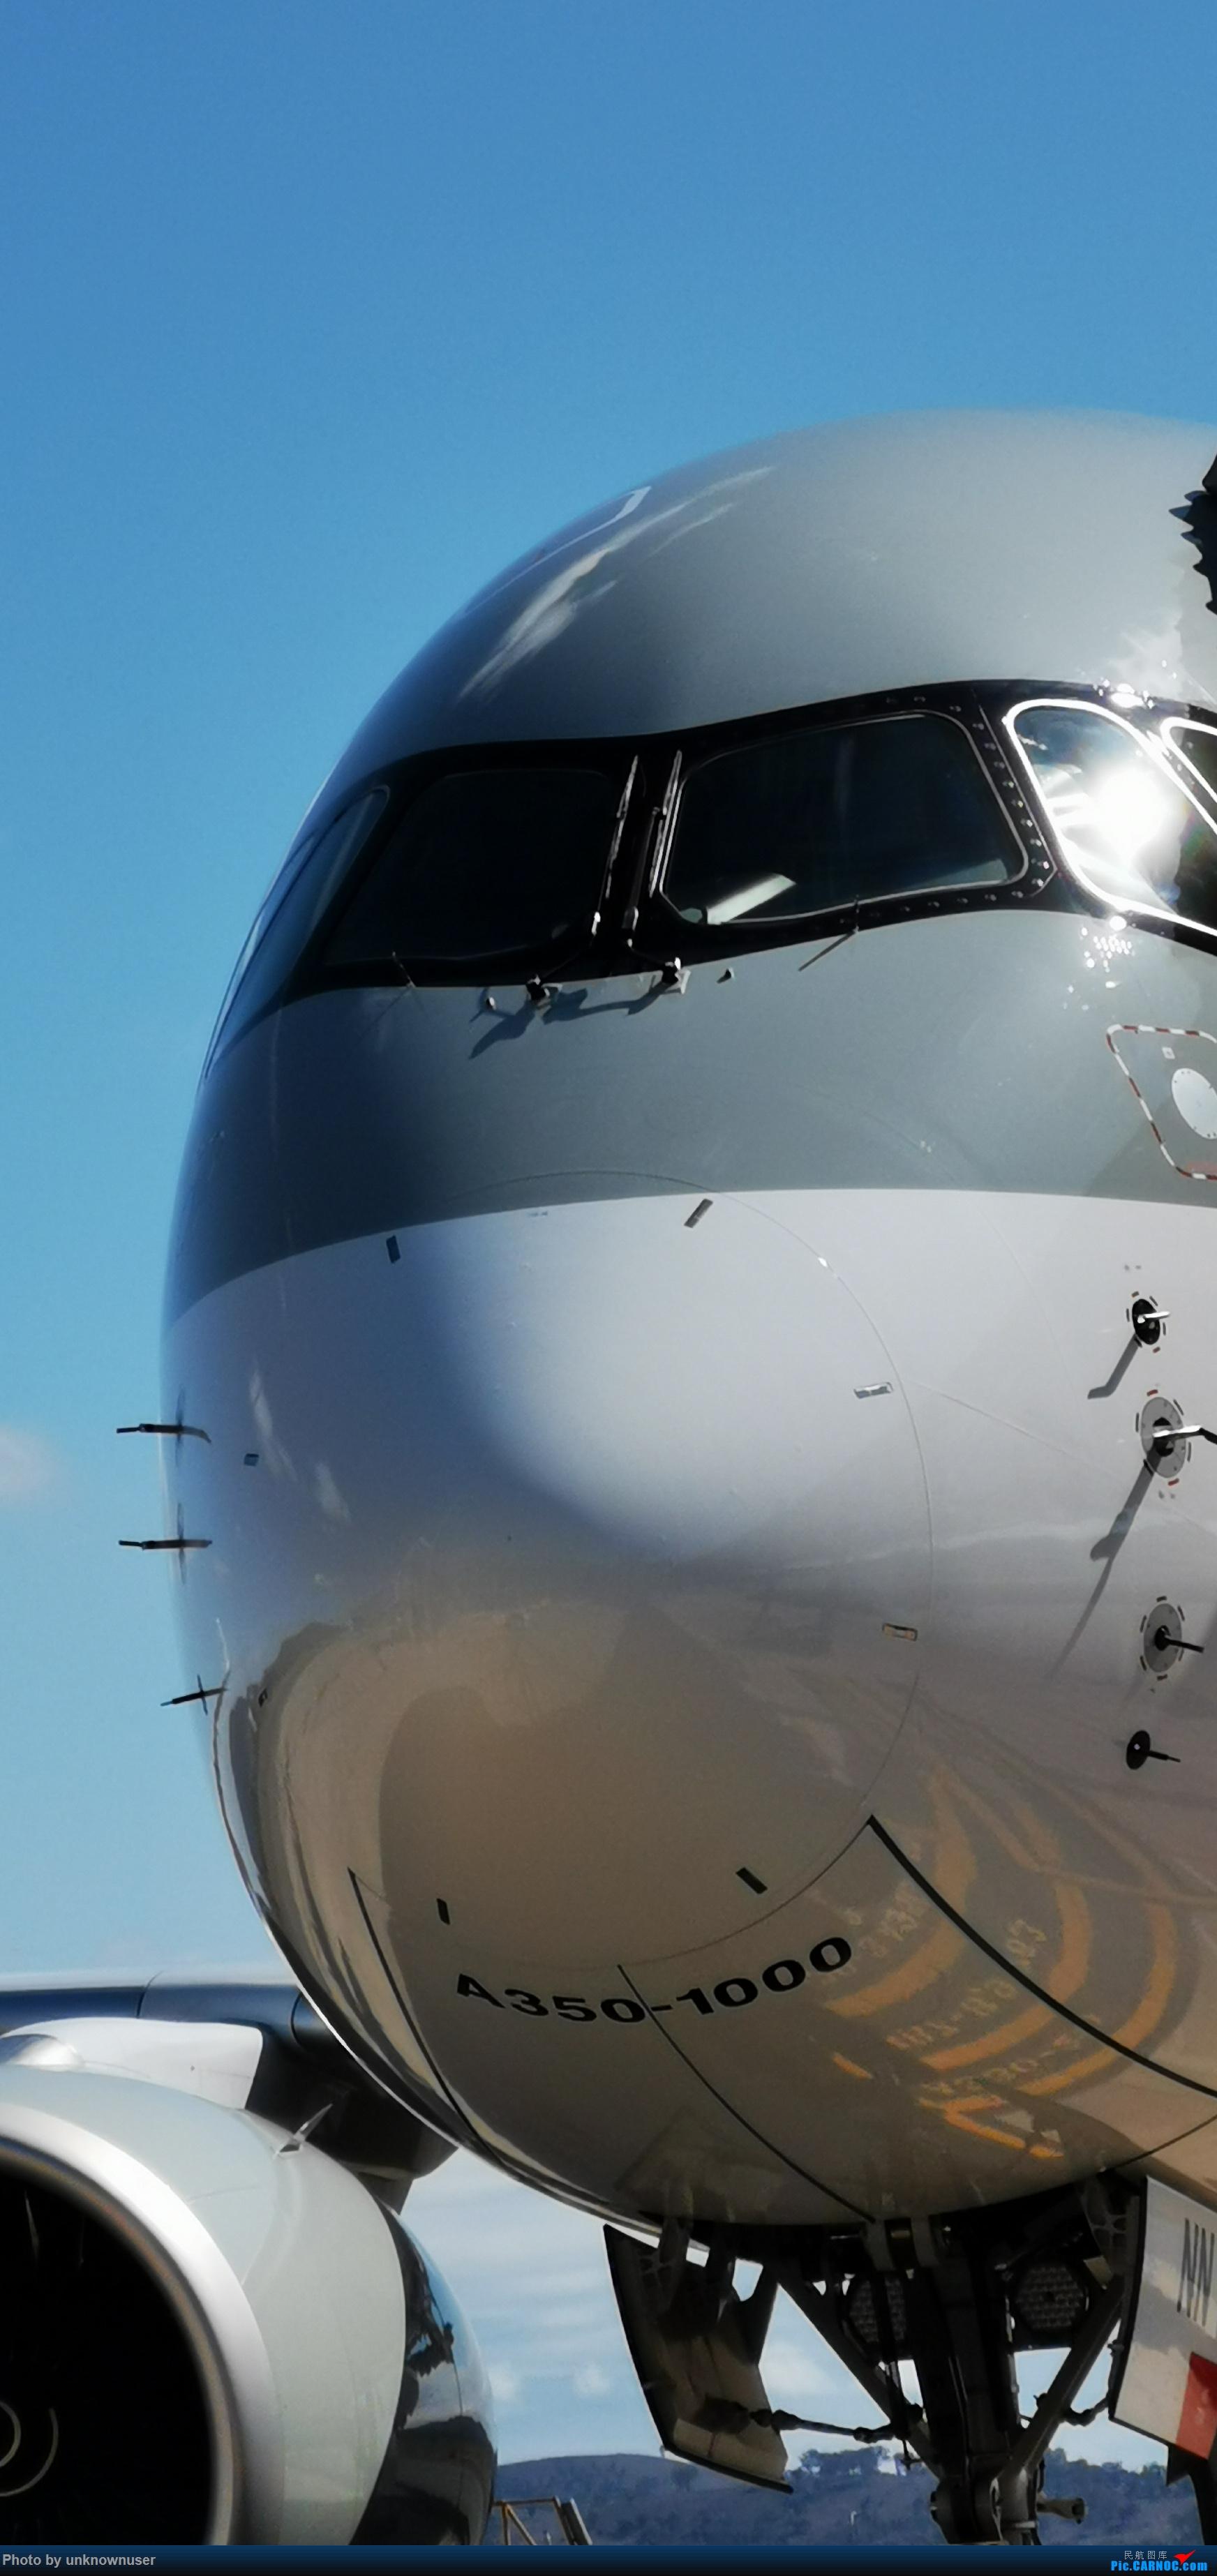 Re:[原创]QR A350-1000 超近距离实拍 A350-1000